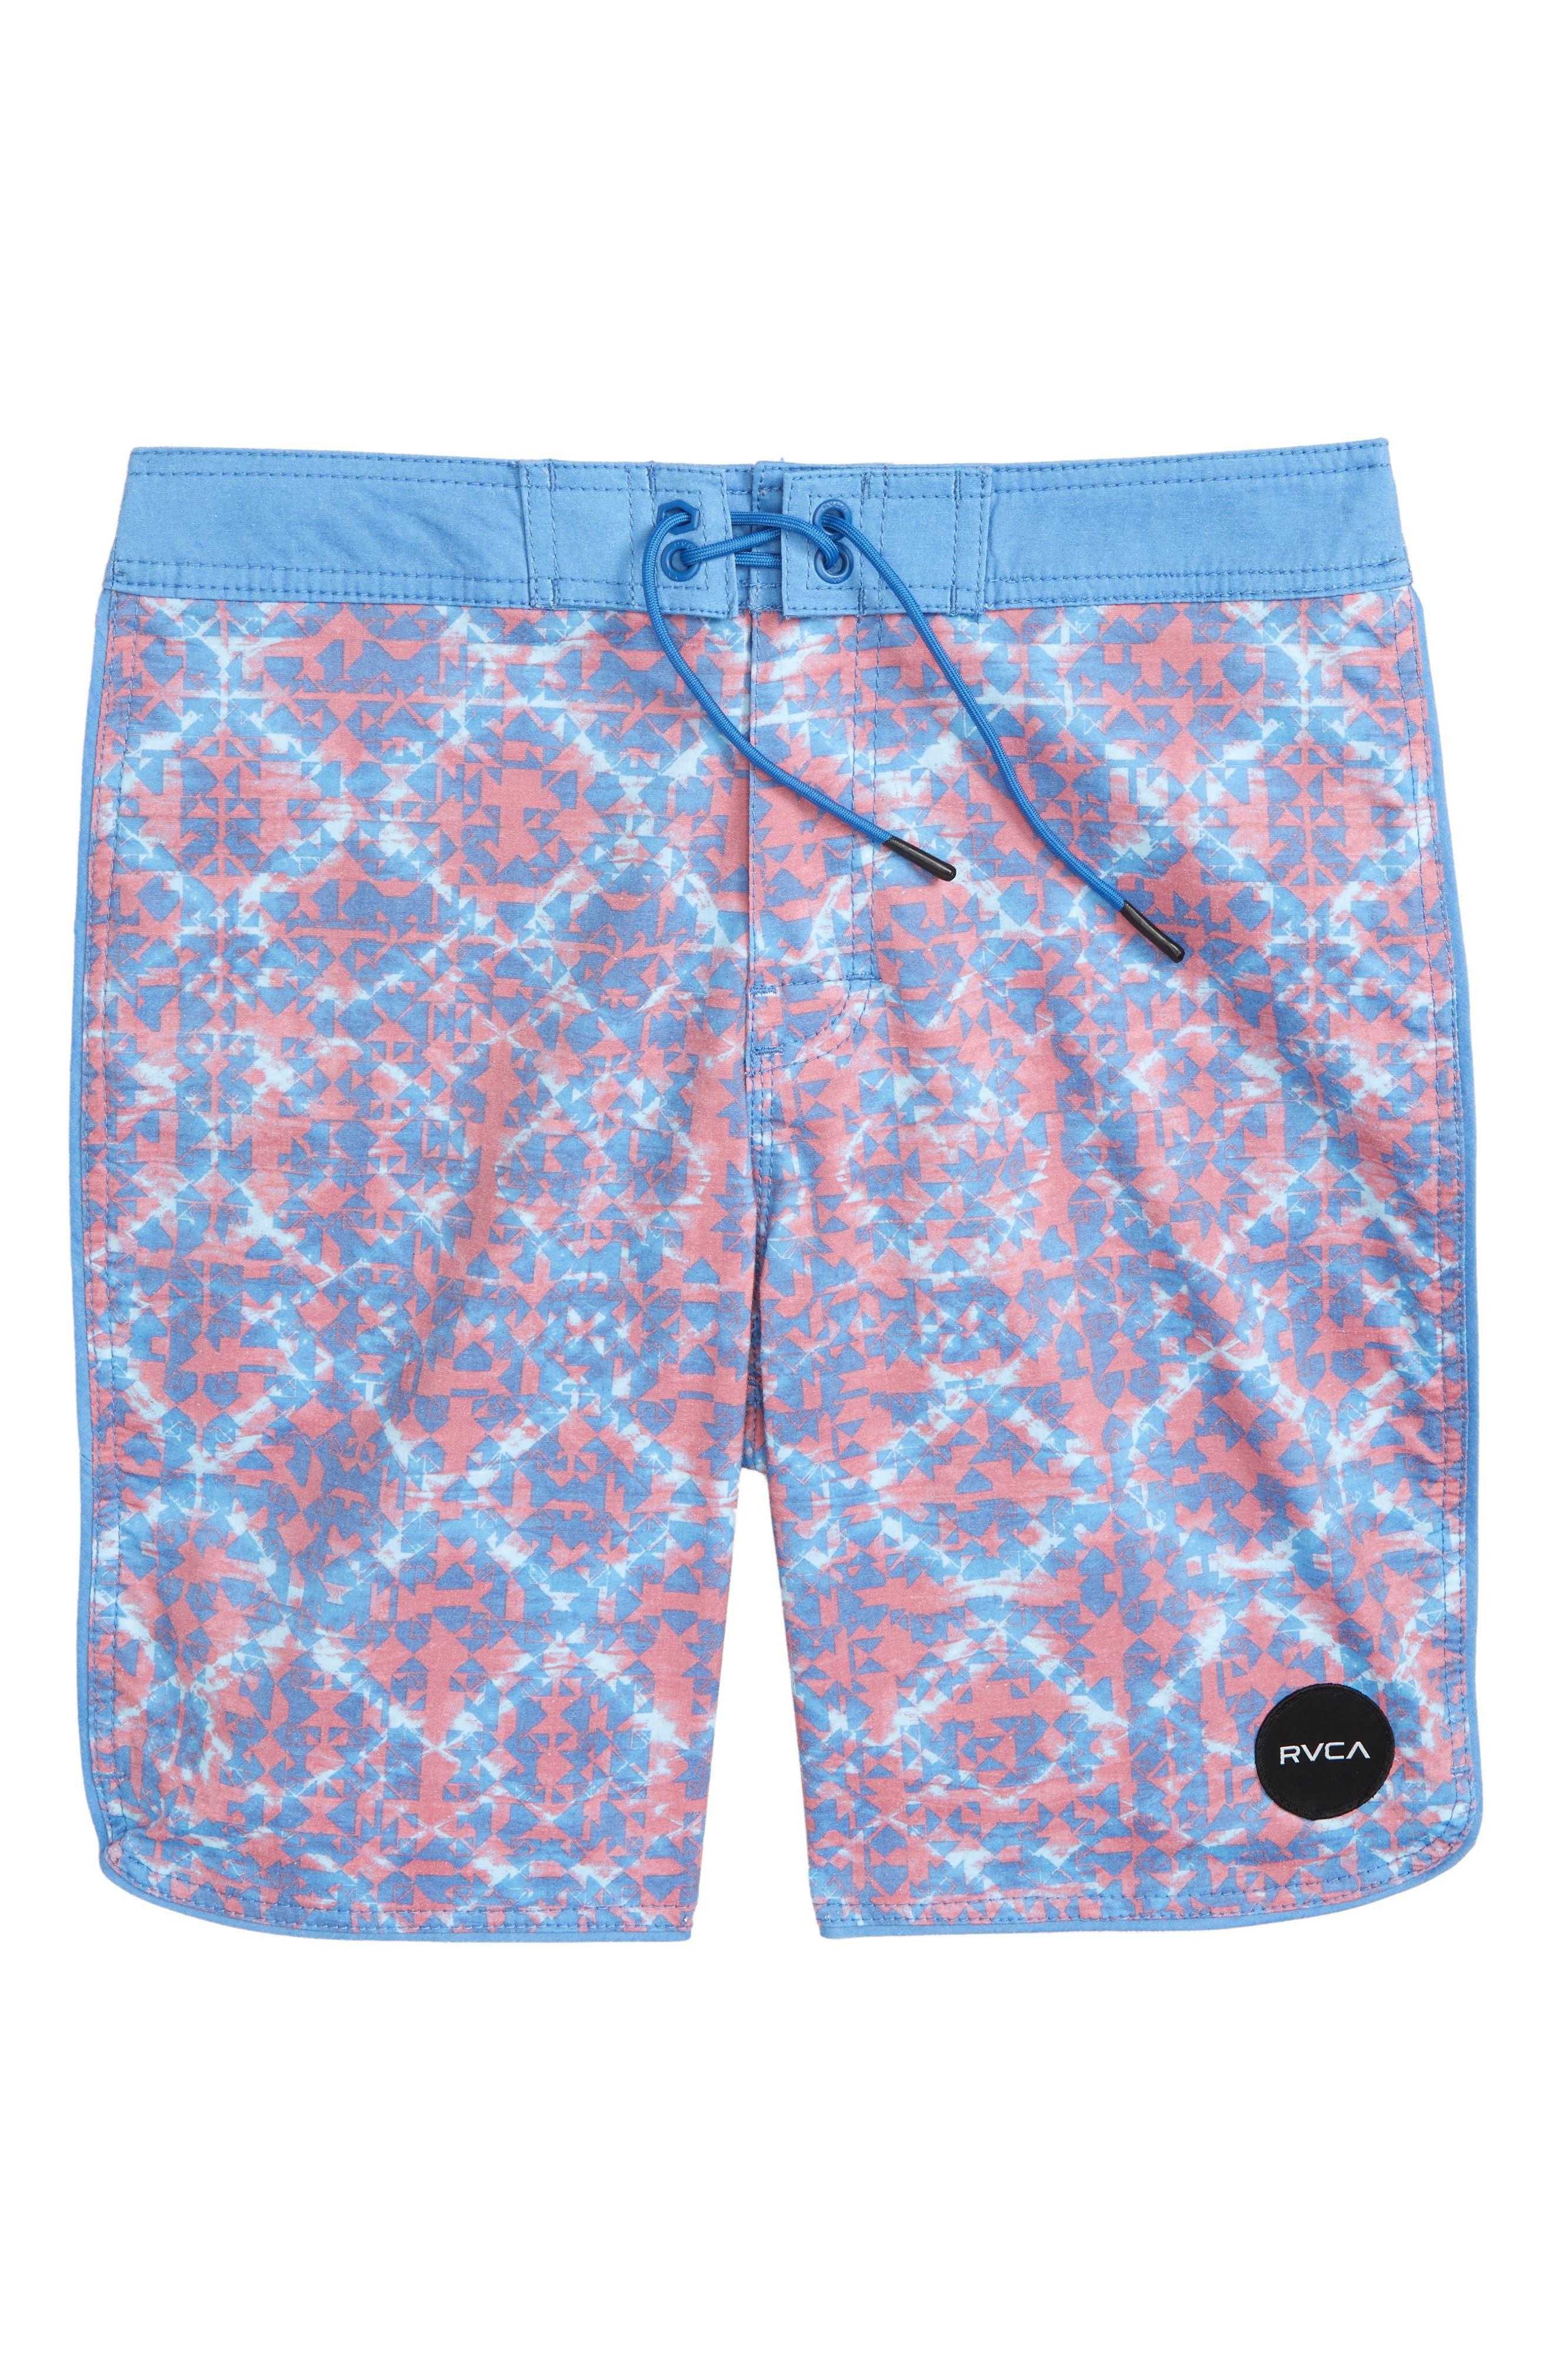 Sanur Board Shorts,                             Main thumbnail 1, color,                             Cobalt